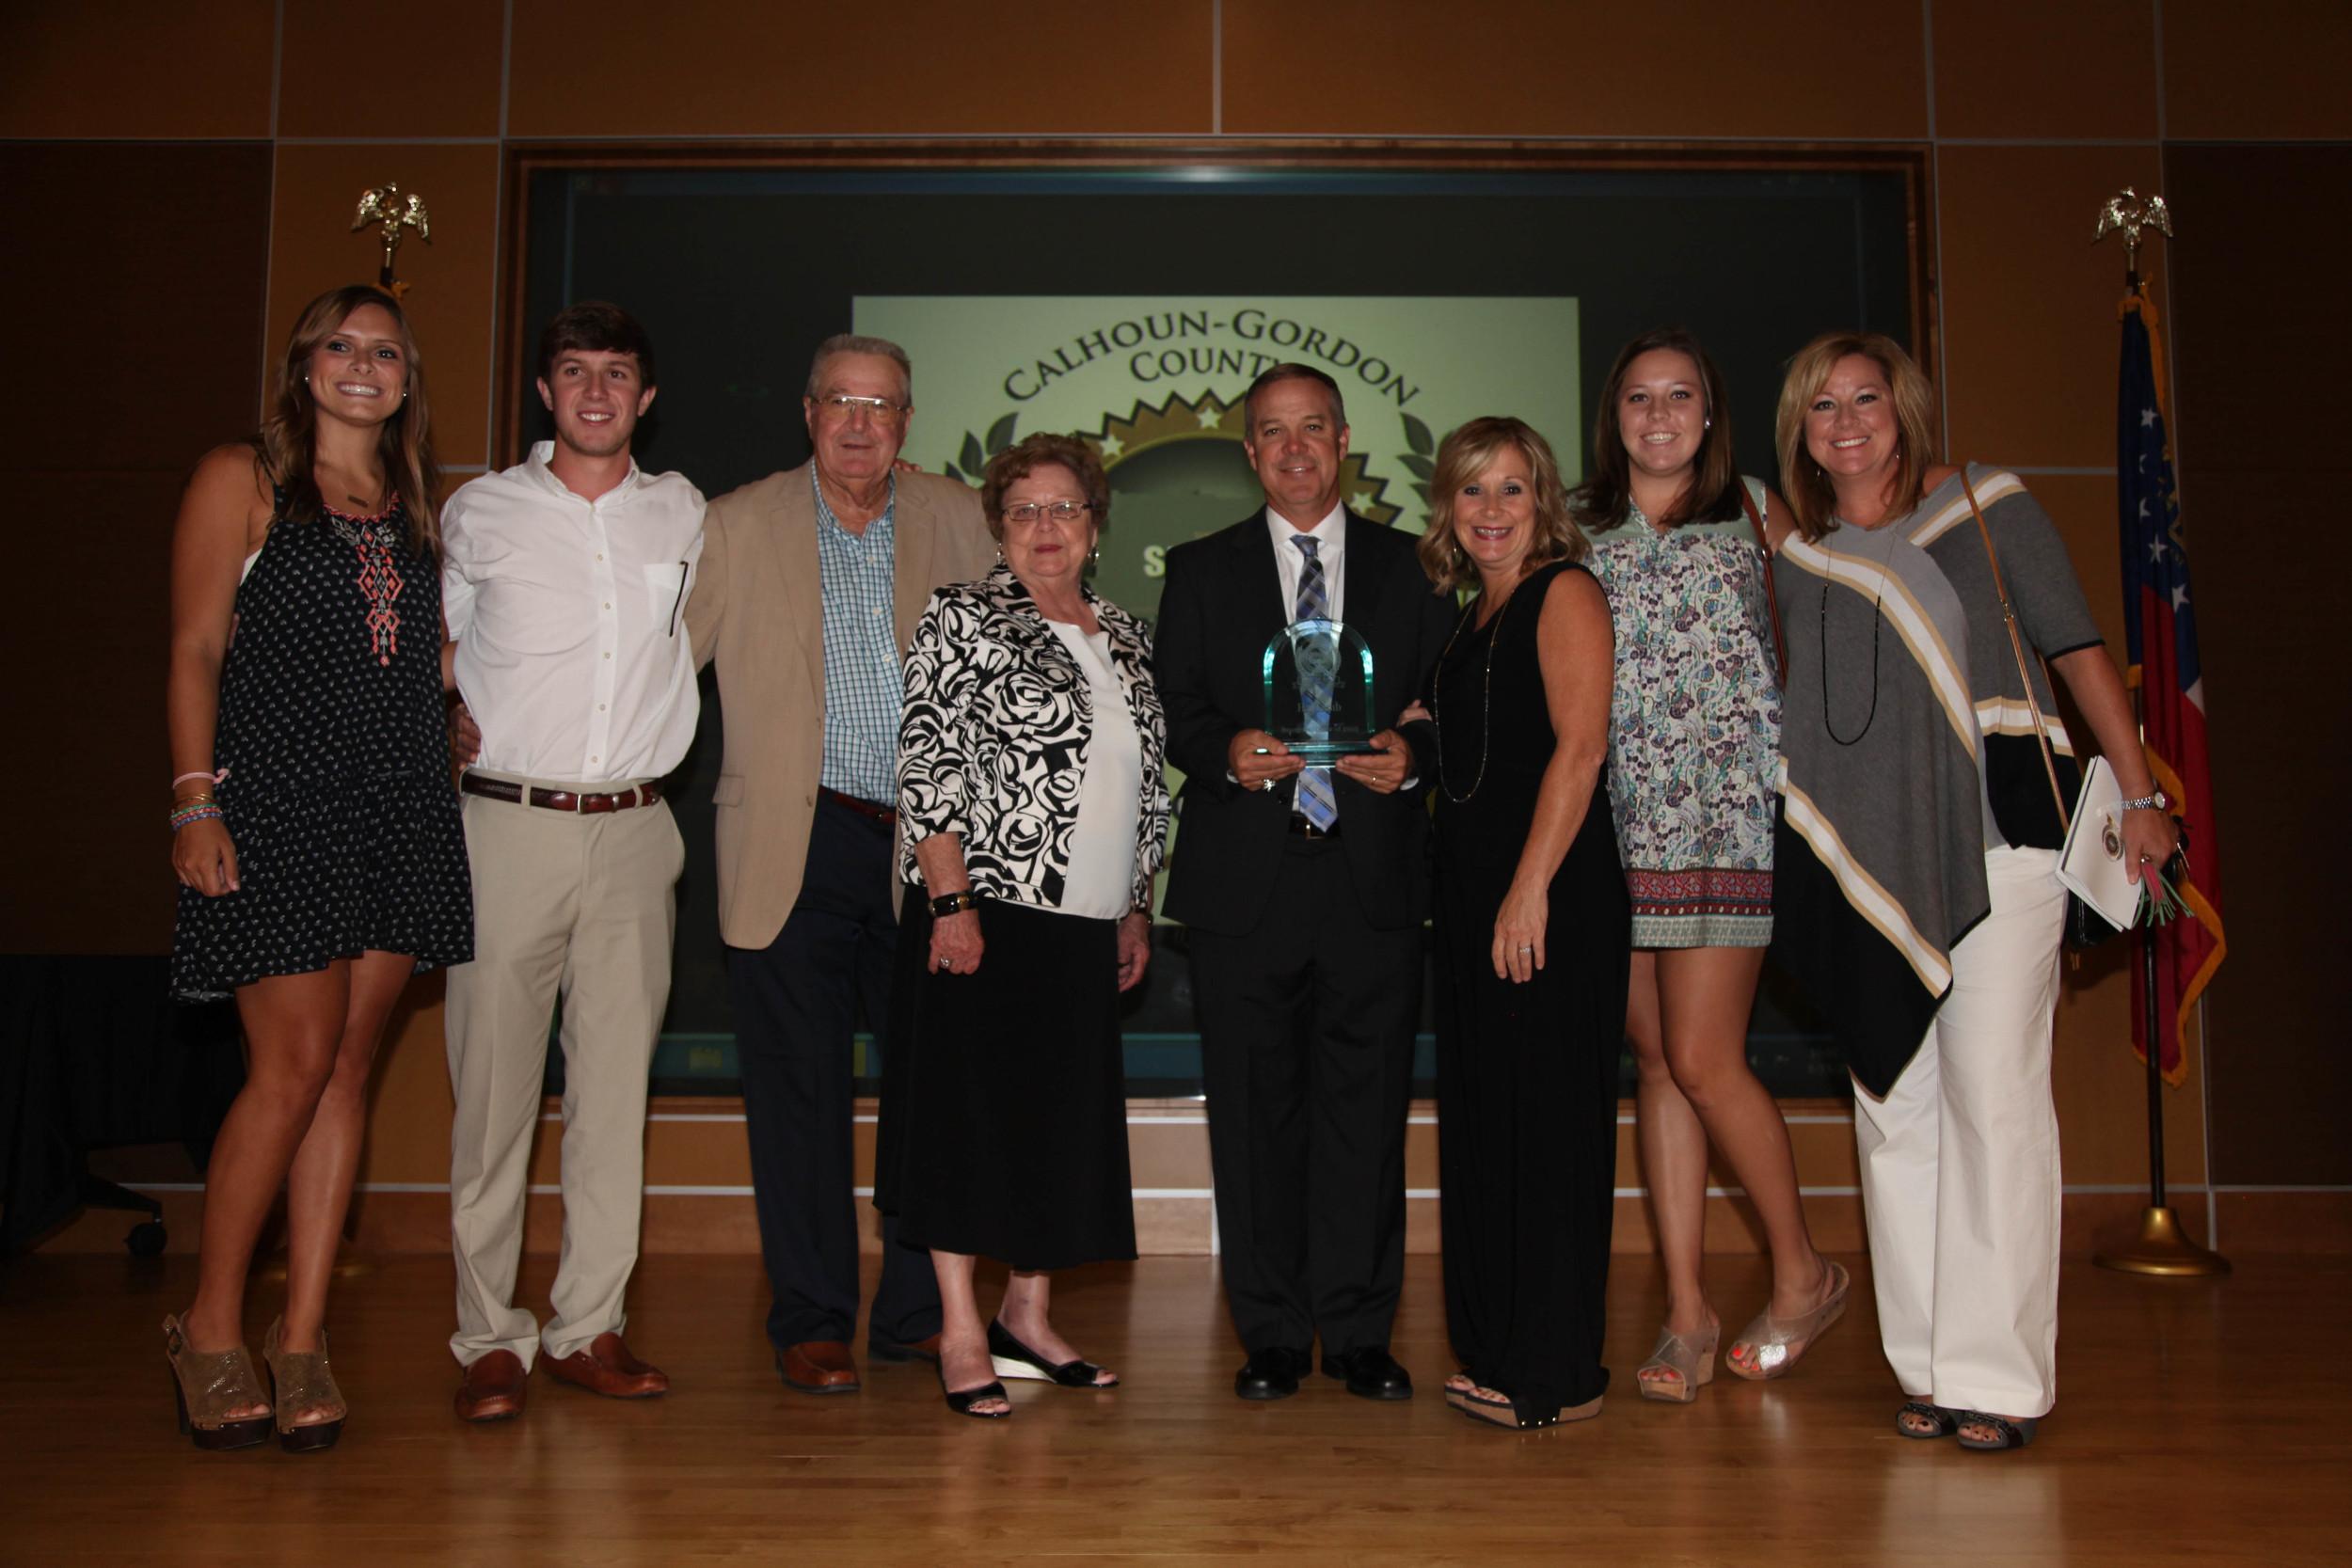 Calhoun-Gordon-County-Sports-Hall-of-Fame-2015-197.jpg